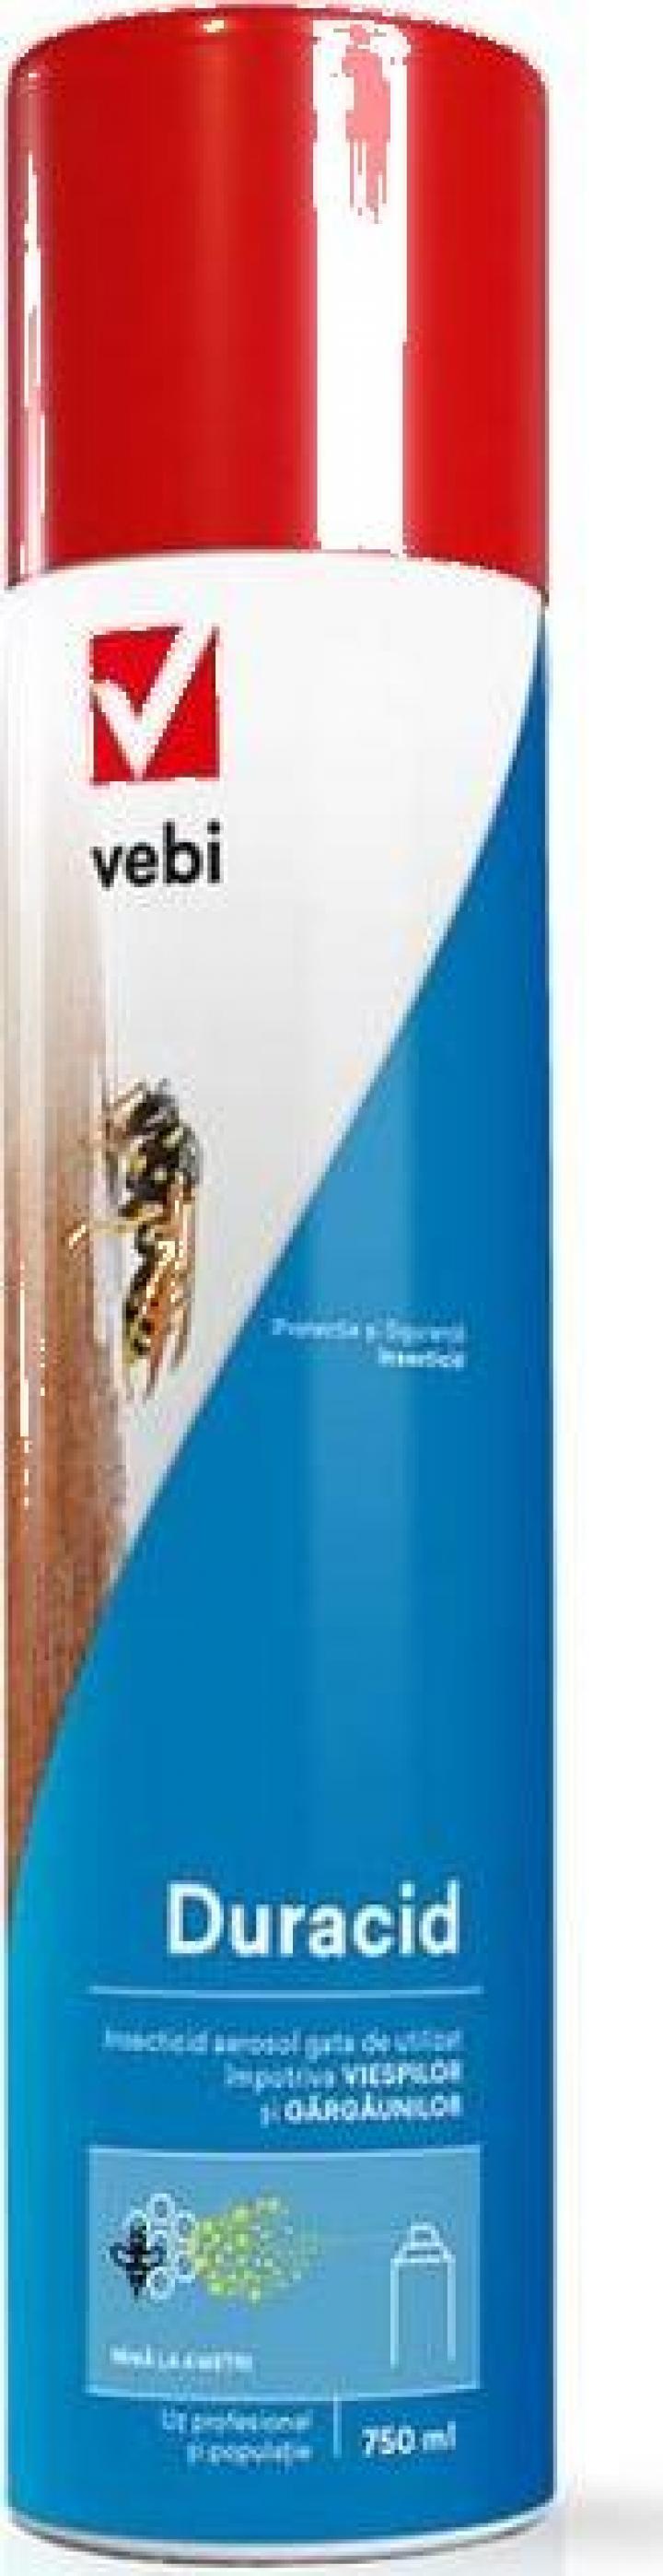 Spray viespi Duracid 750 ml.